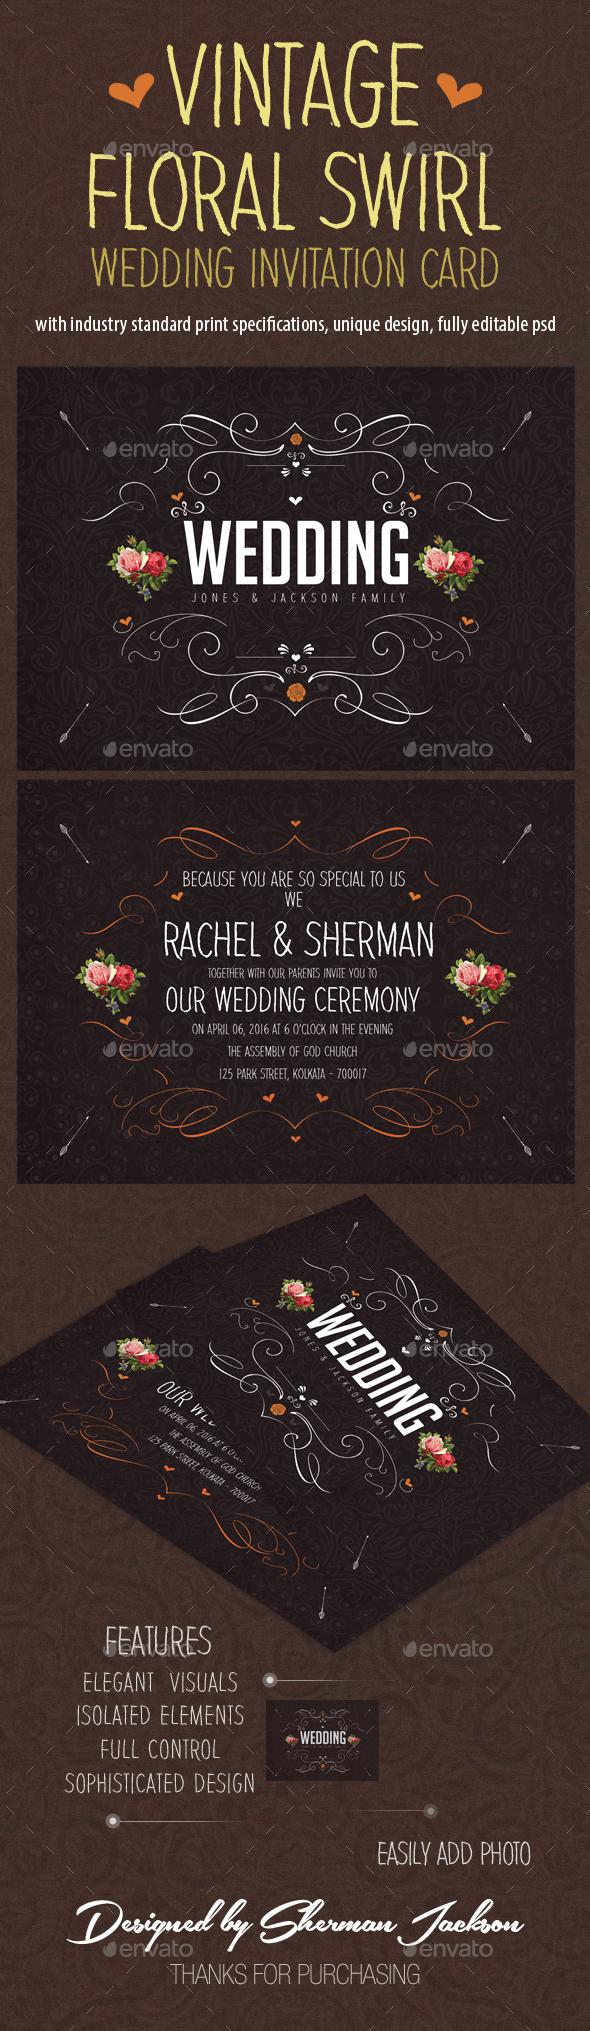 Vintage Floral Swirl Wedding Invitation Card - Weddings Cards & Invites